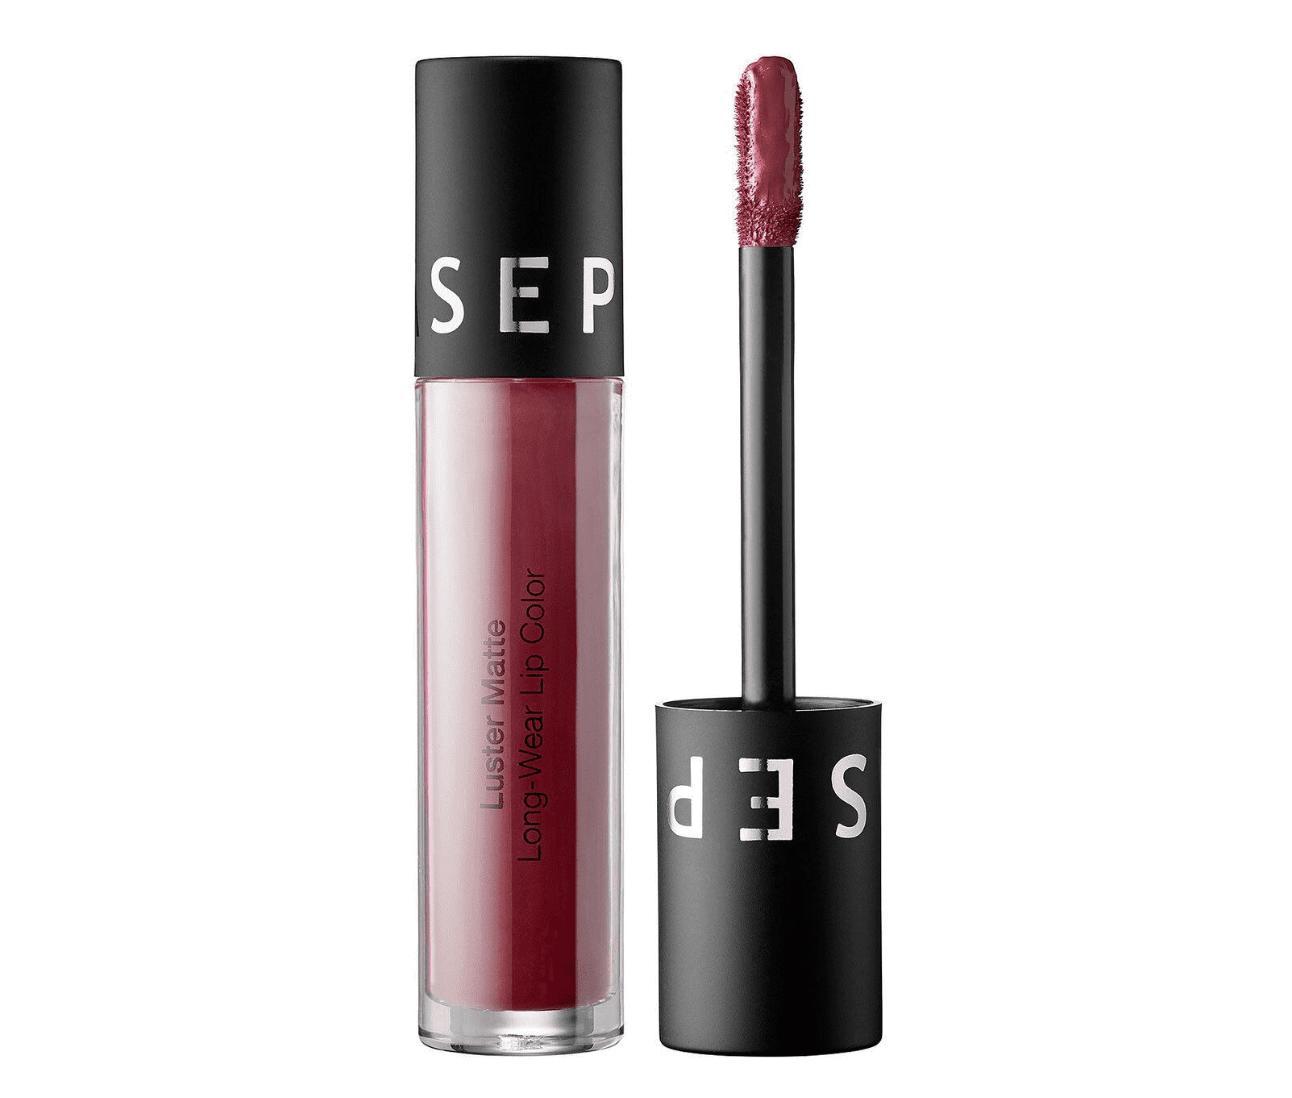 Sephora Luster Matte Long-Wear Lip Color Deep Plum Luster